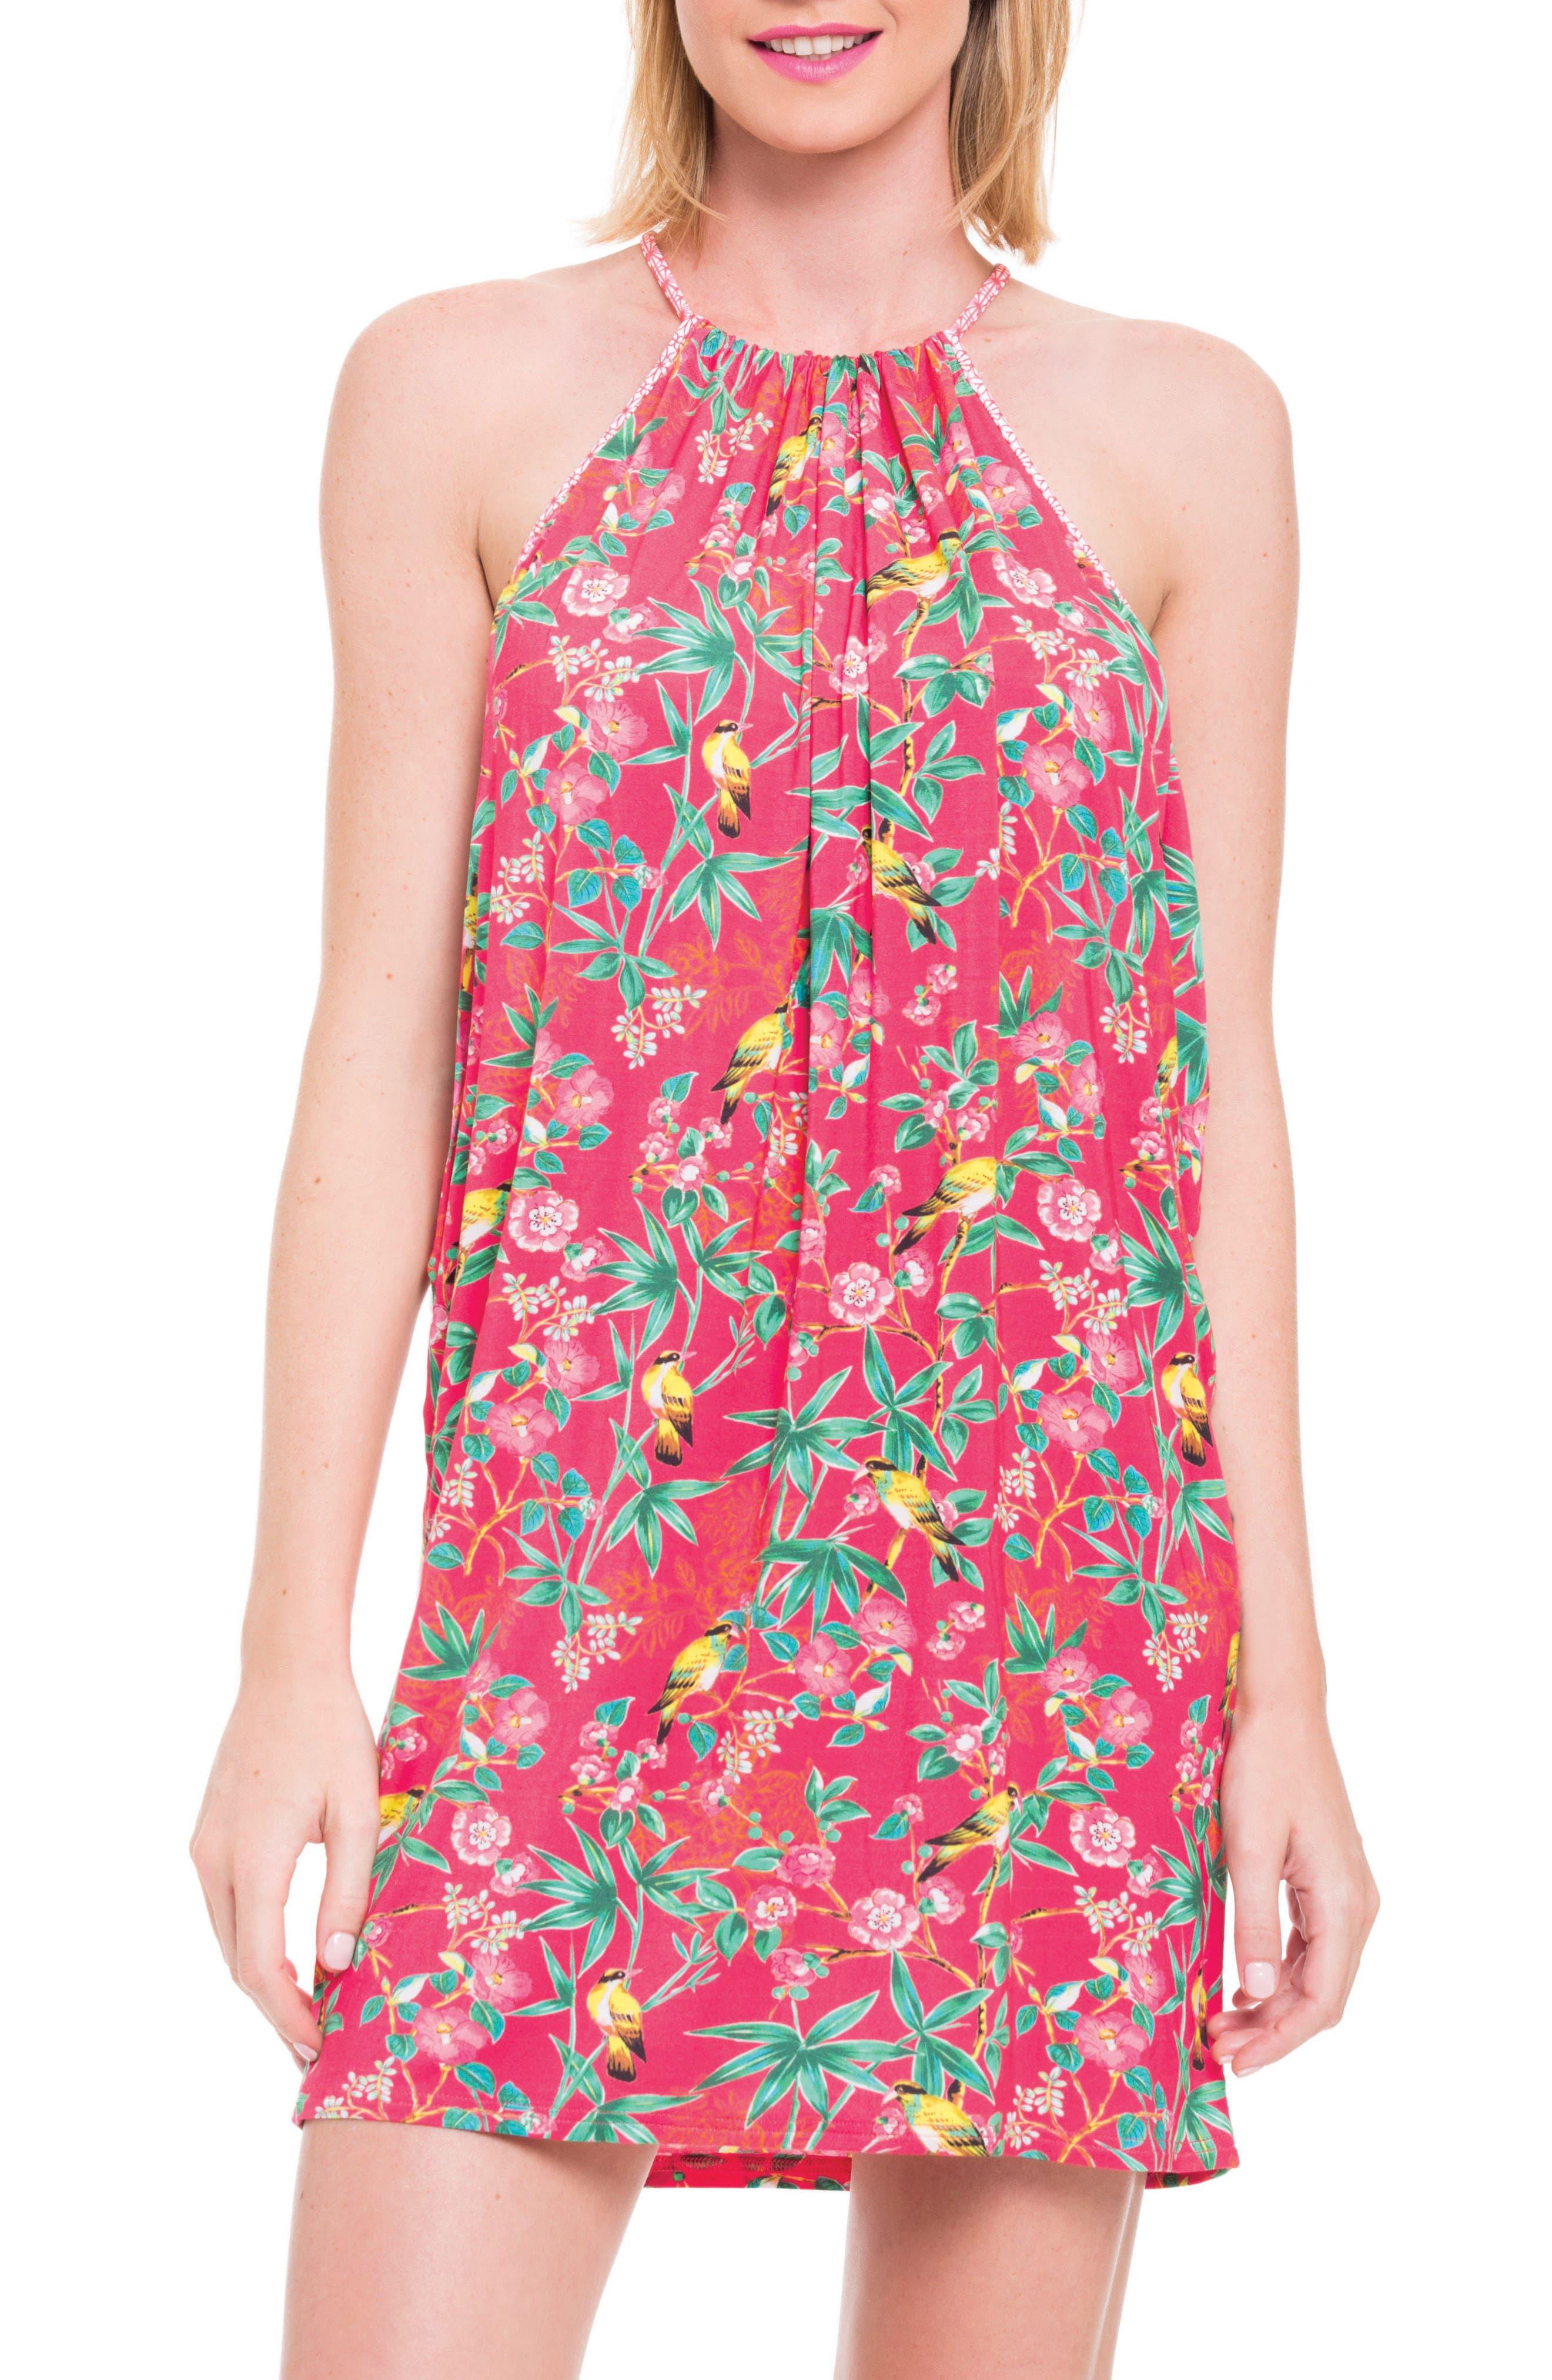 Blush by Profile Japanika Cover-Up Dress